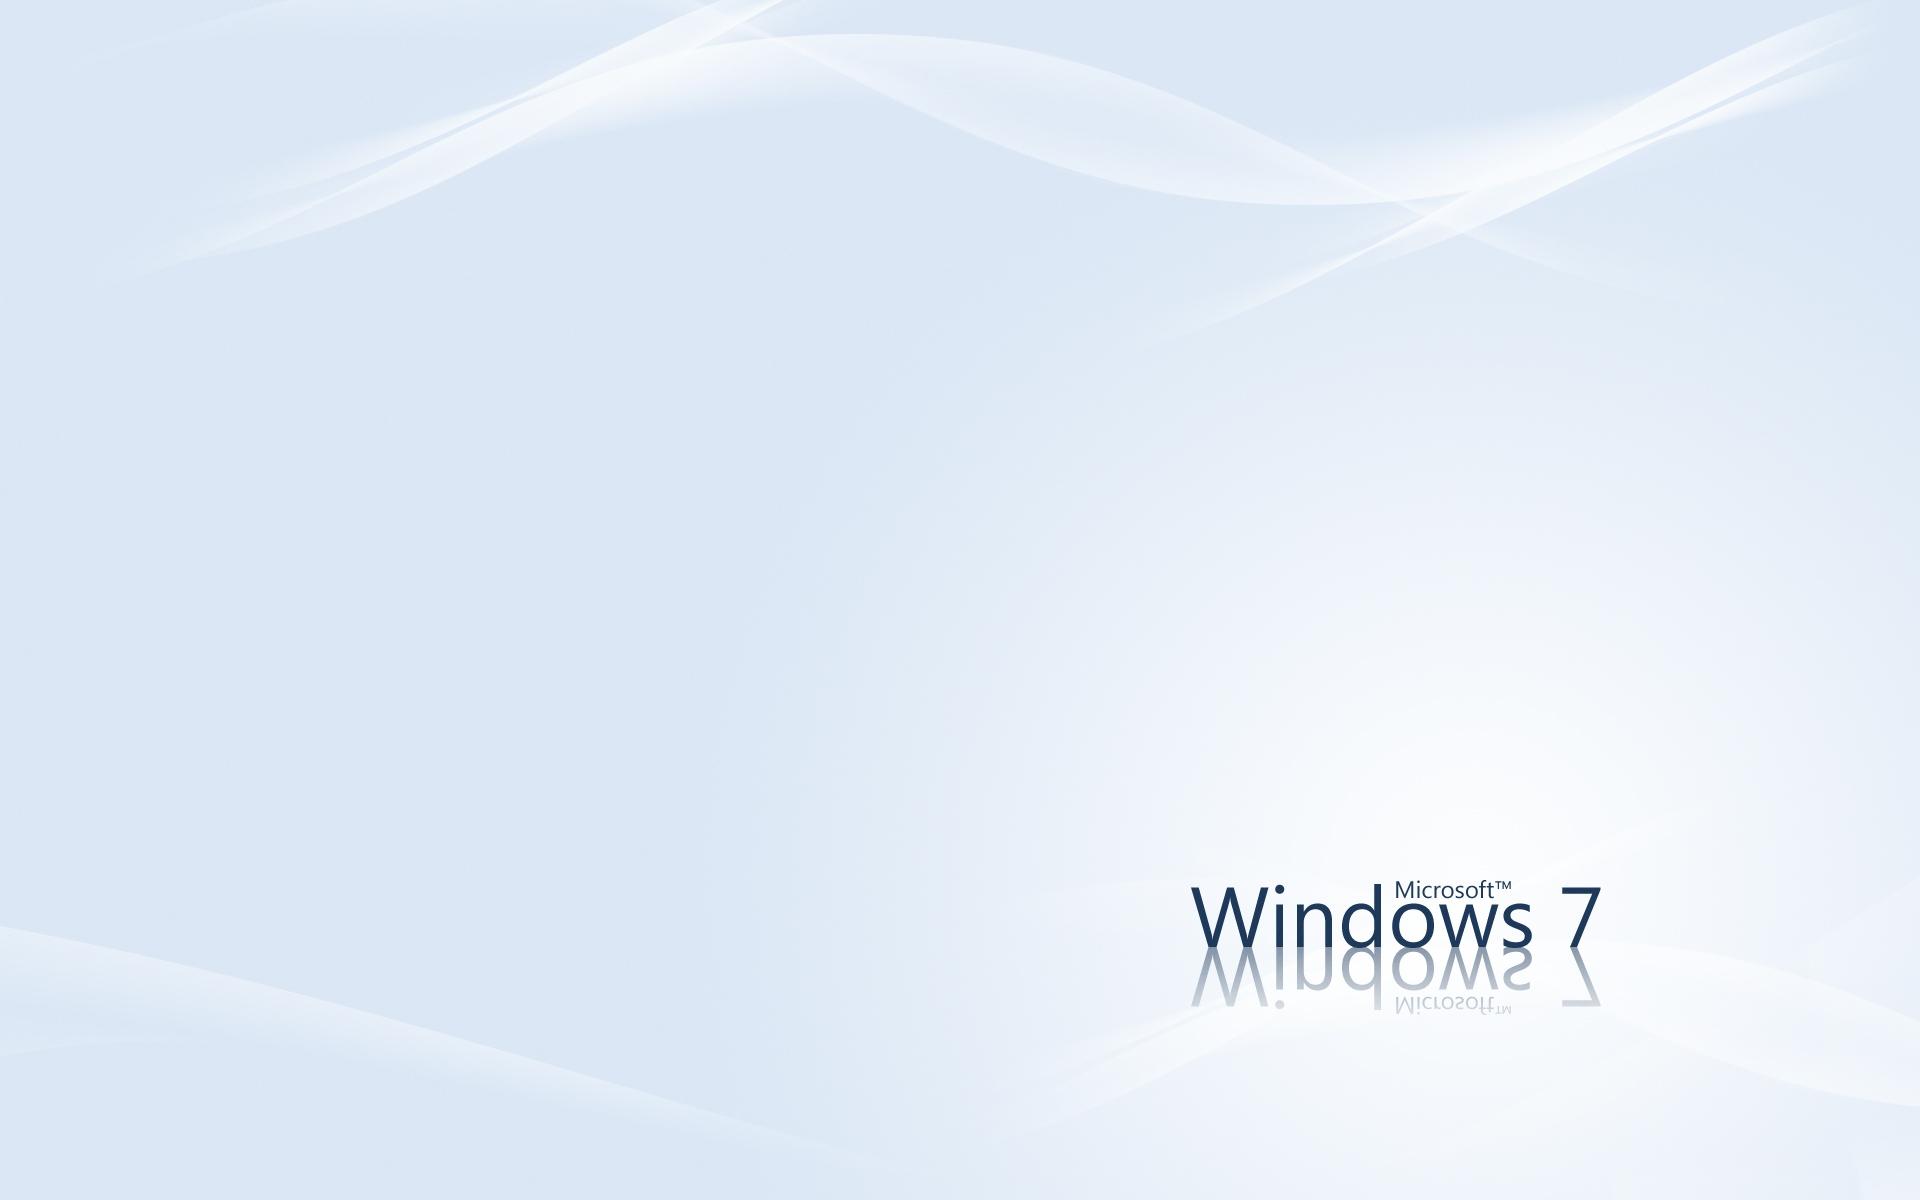 Windows Bright Wallpaper Cool Wallpapers Hd Hdwallsources